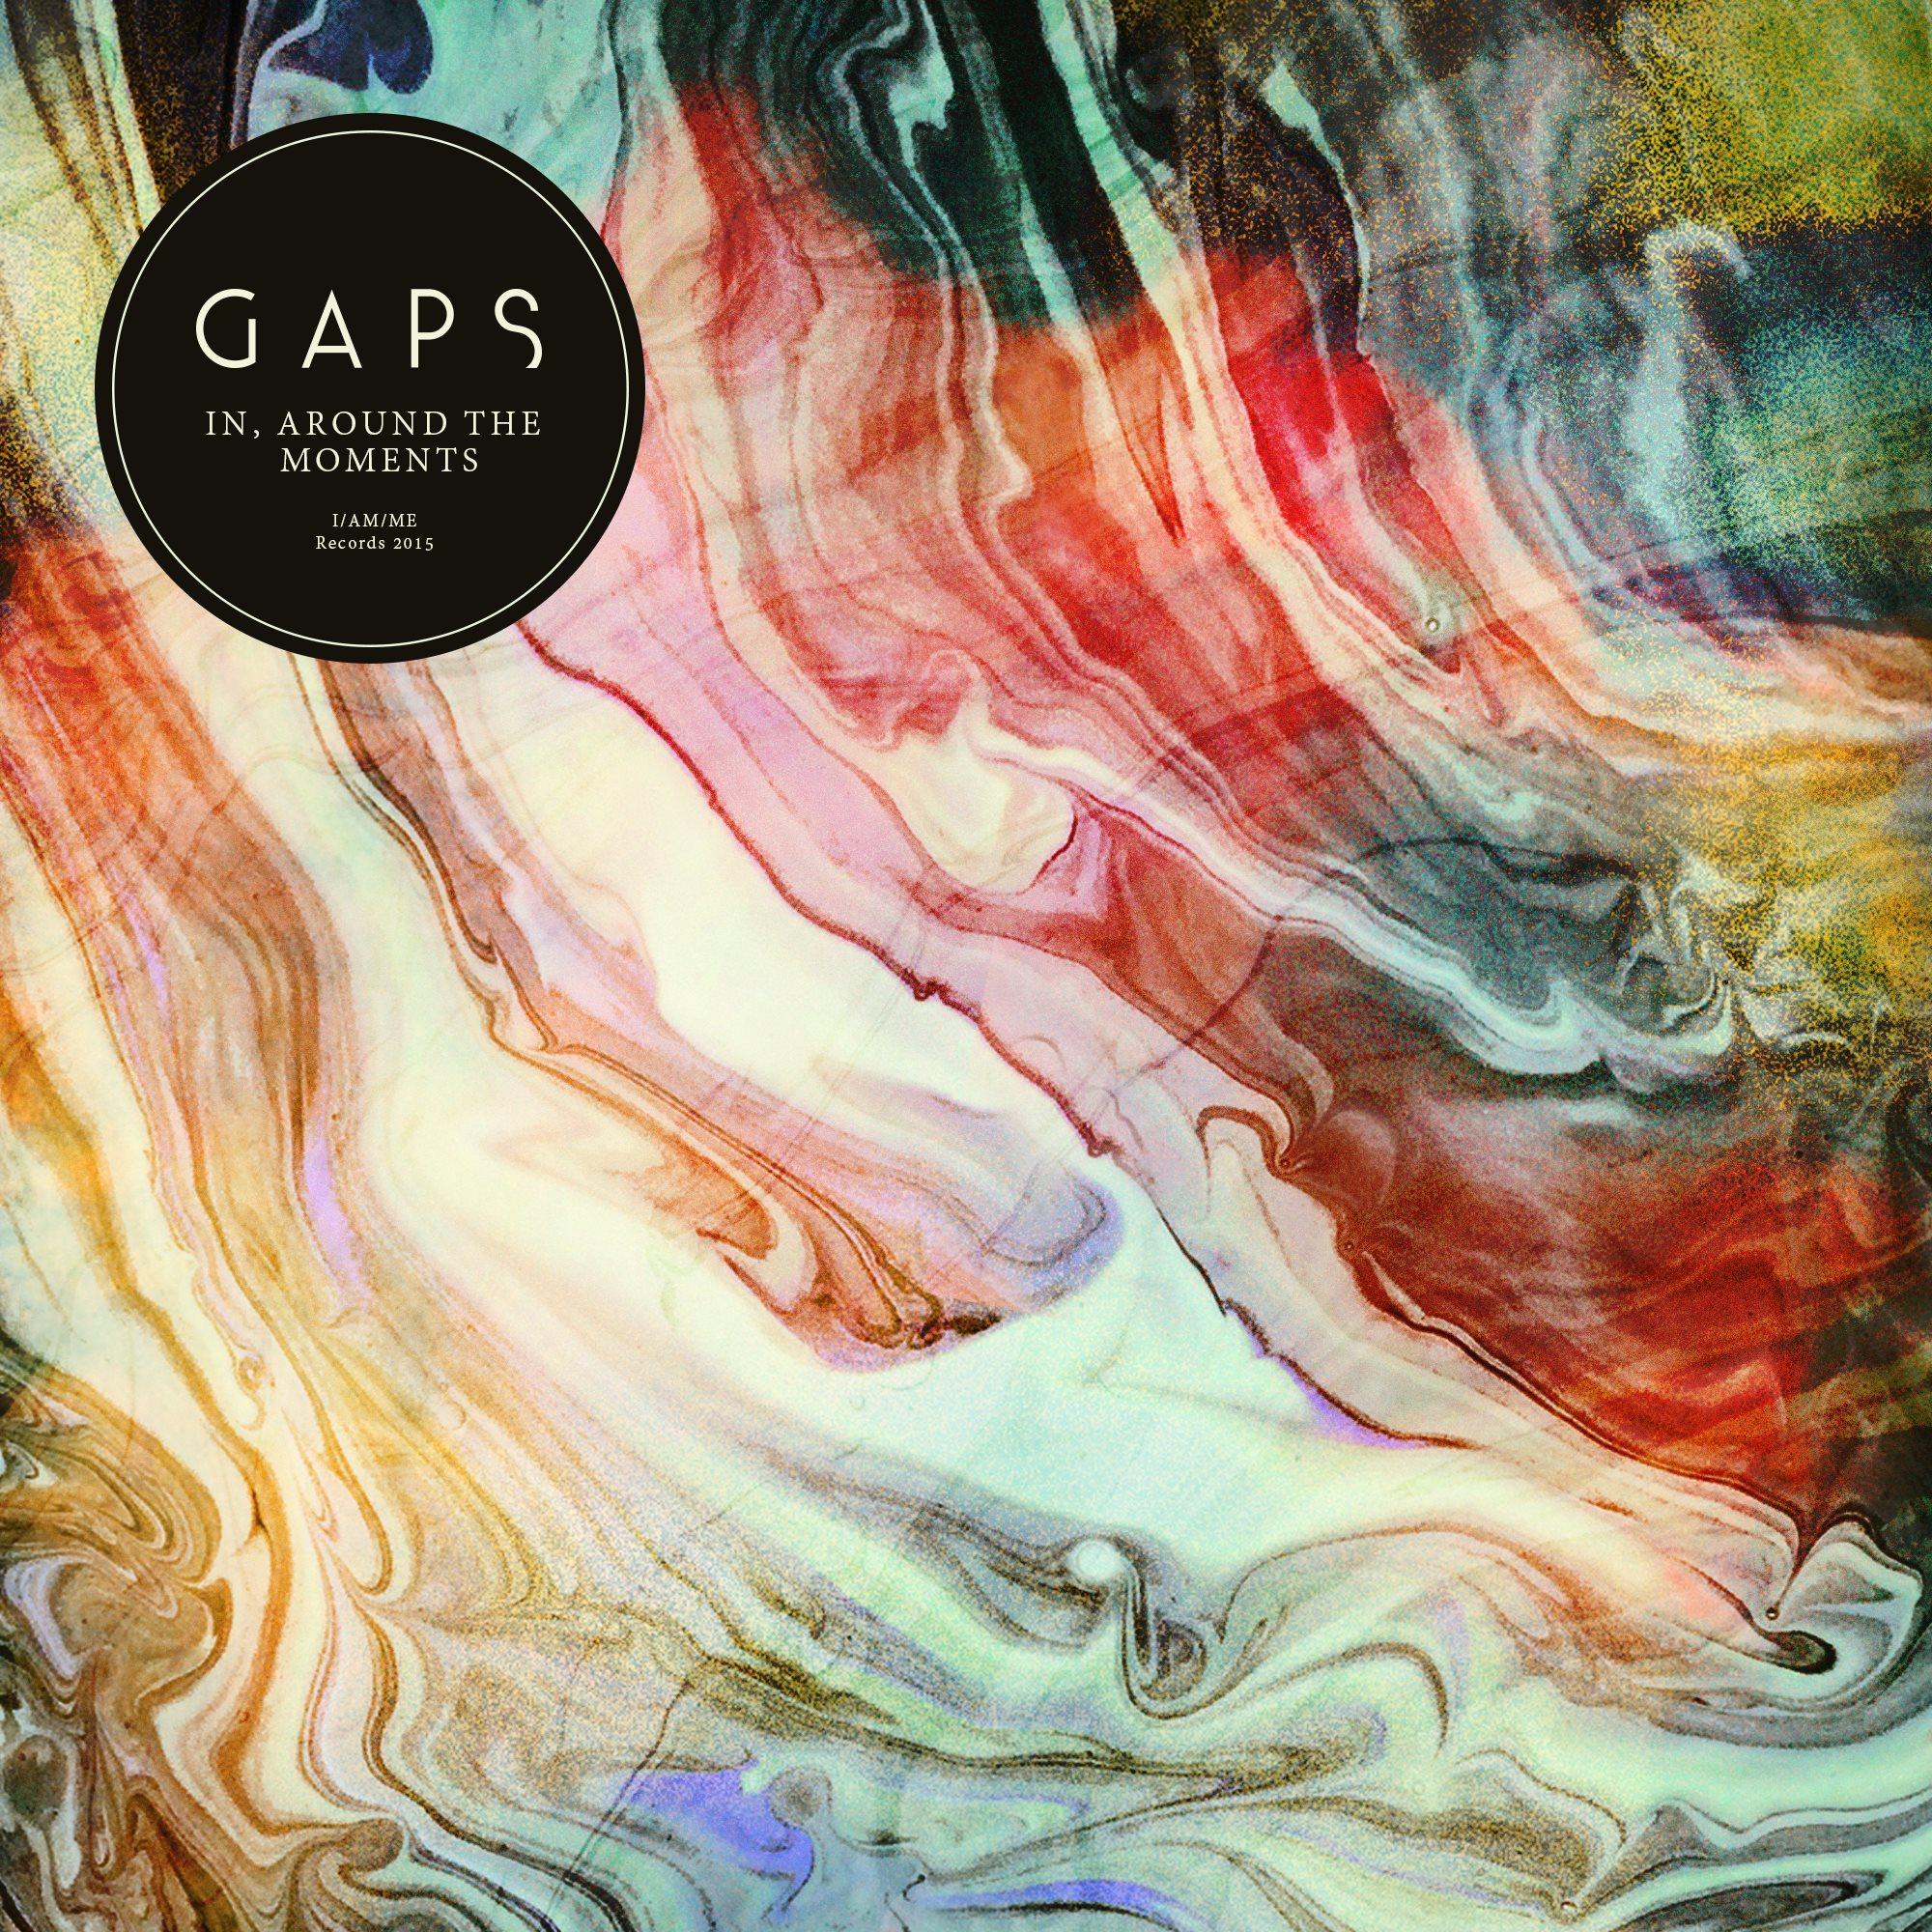 GAPS / In, Around The Moments album news | Brighton Music Blog